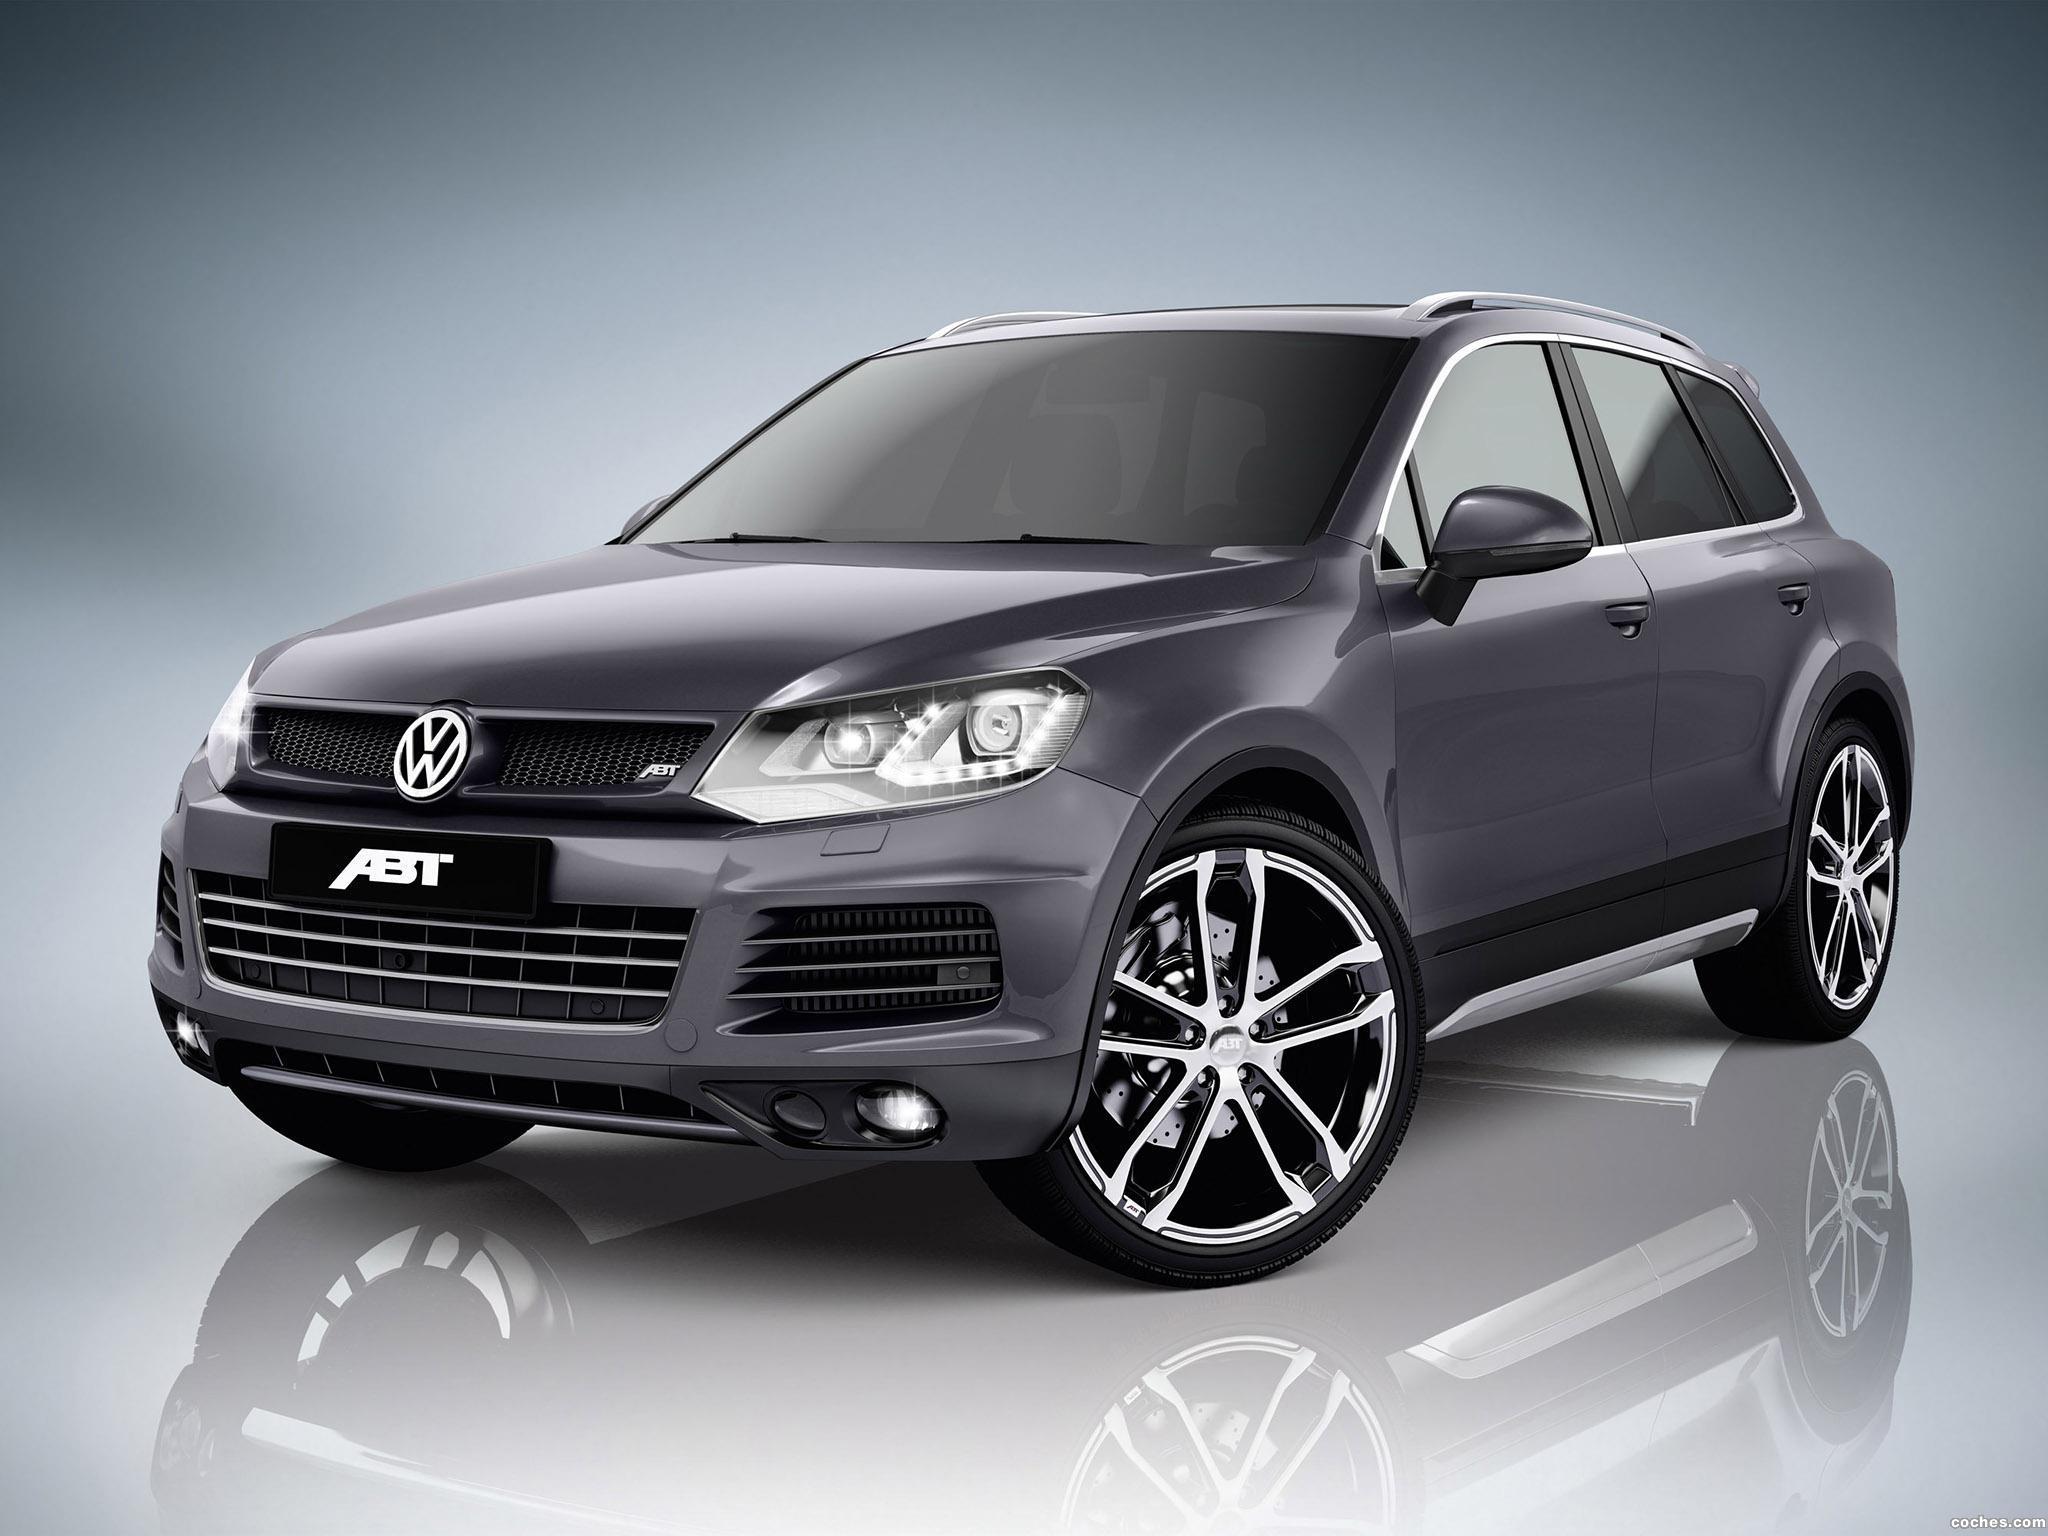 Foto 0 de Volkswagen Touareg abt 2011